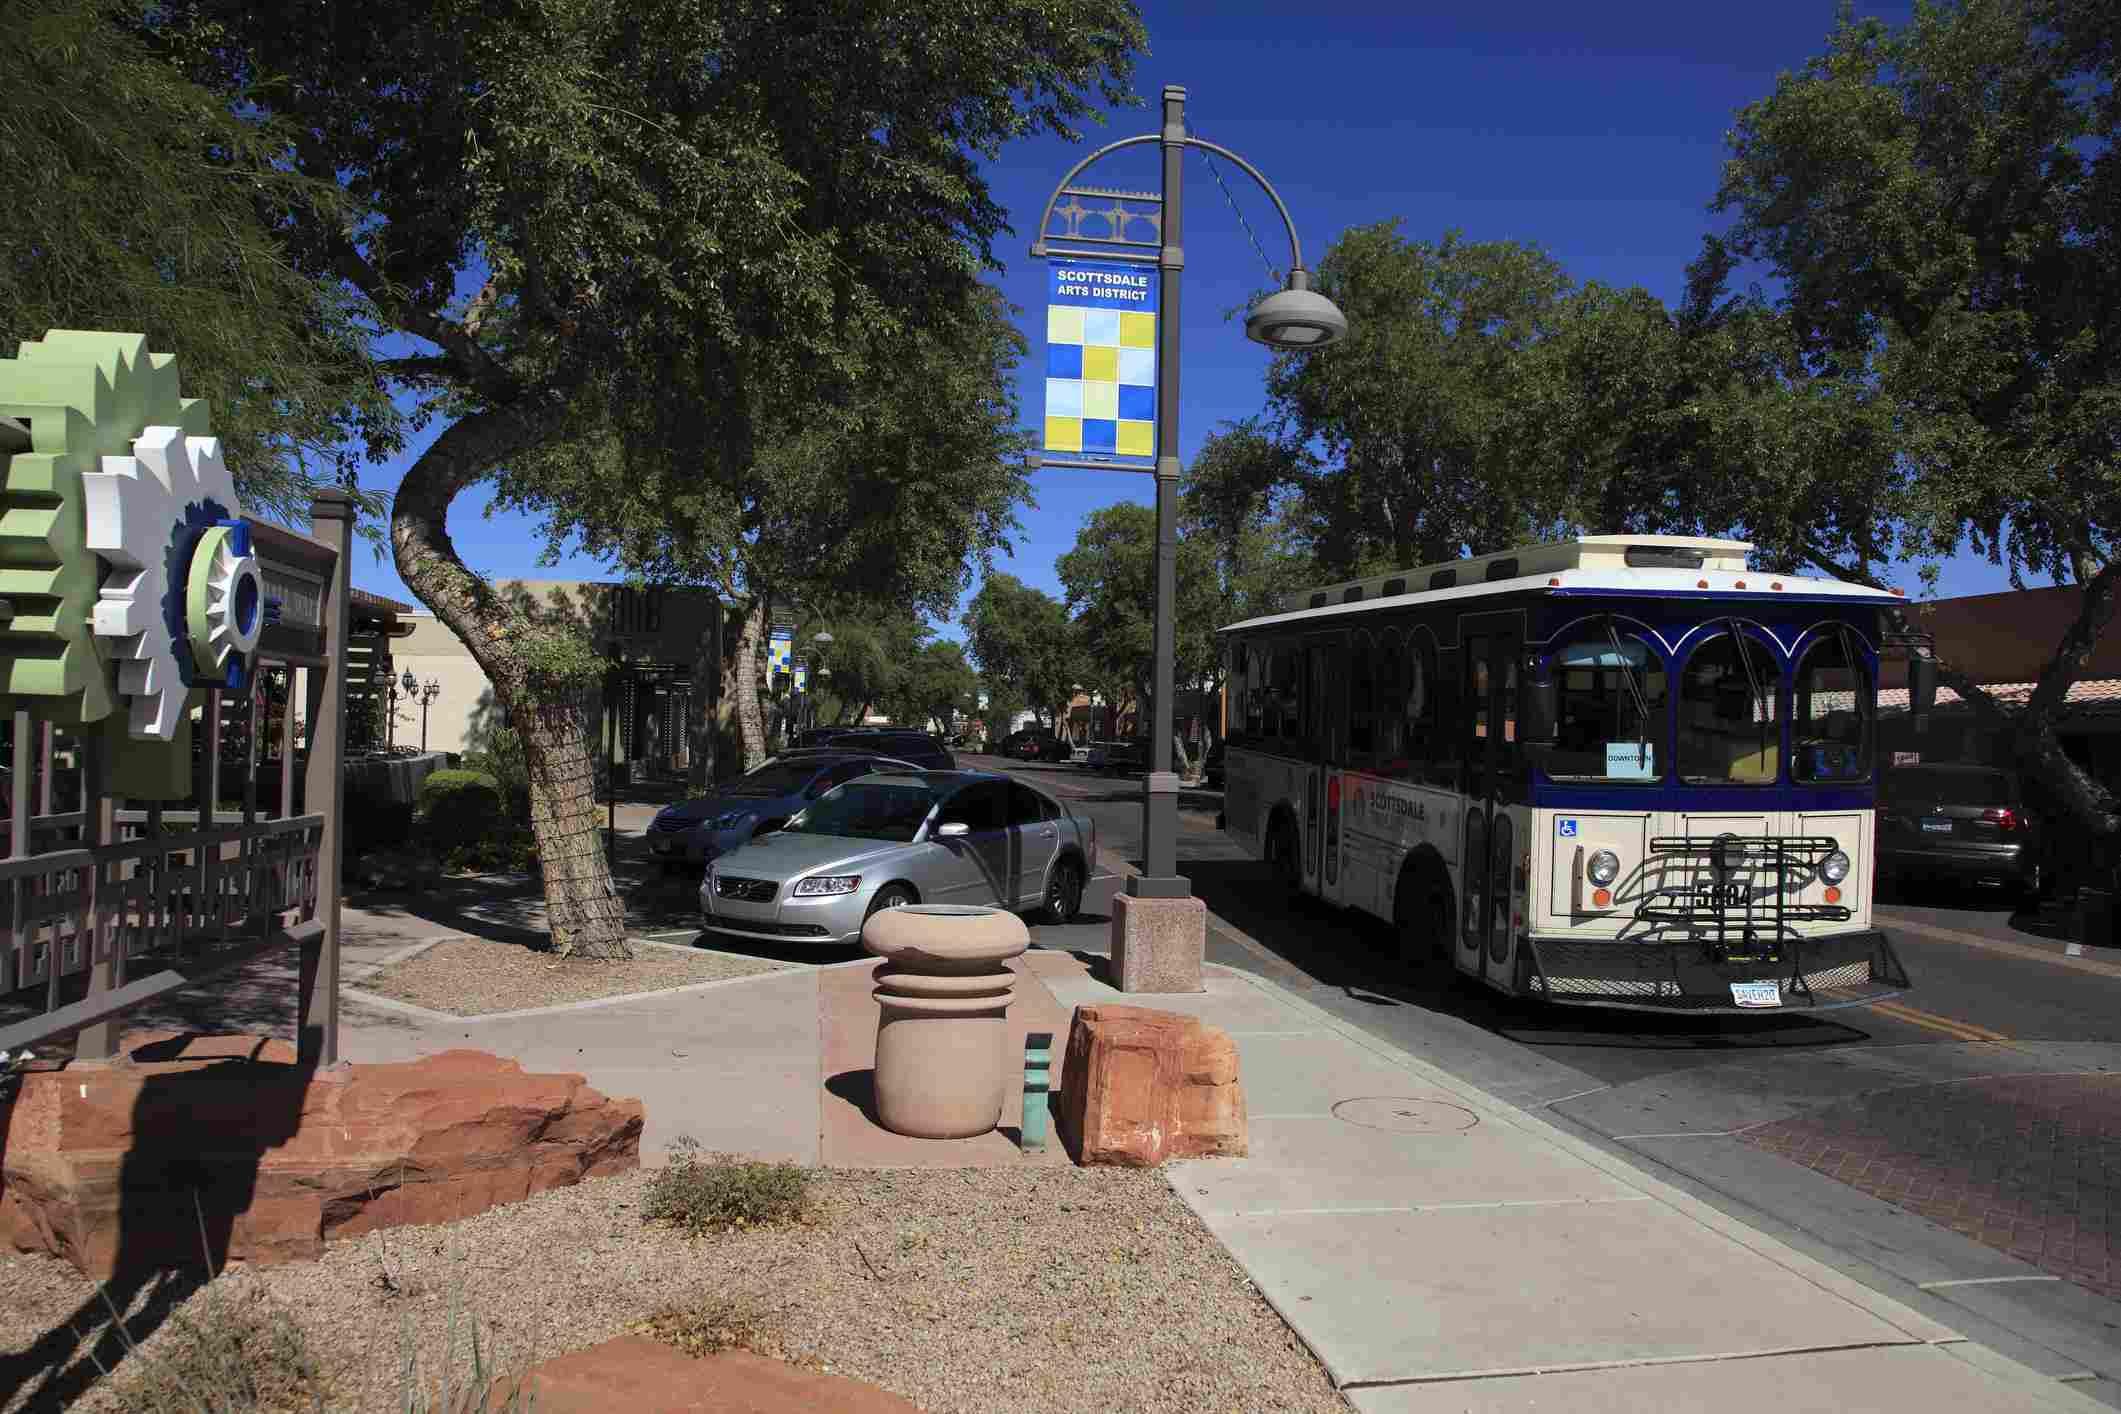 Trolley bus in downtown Scottsdale